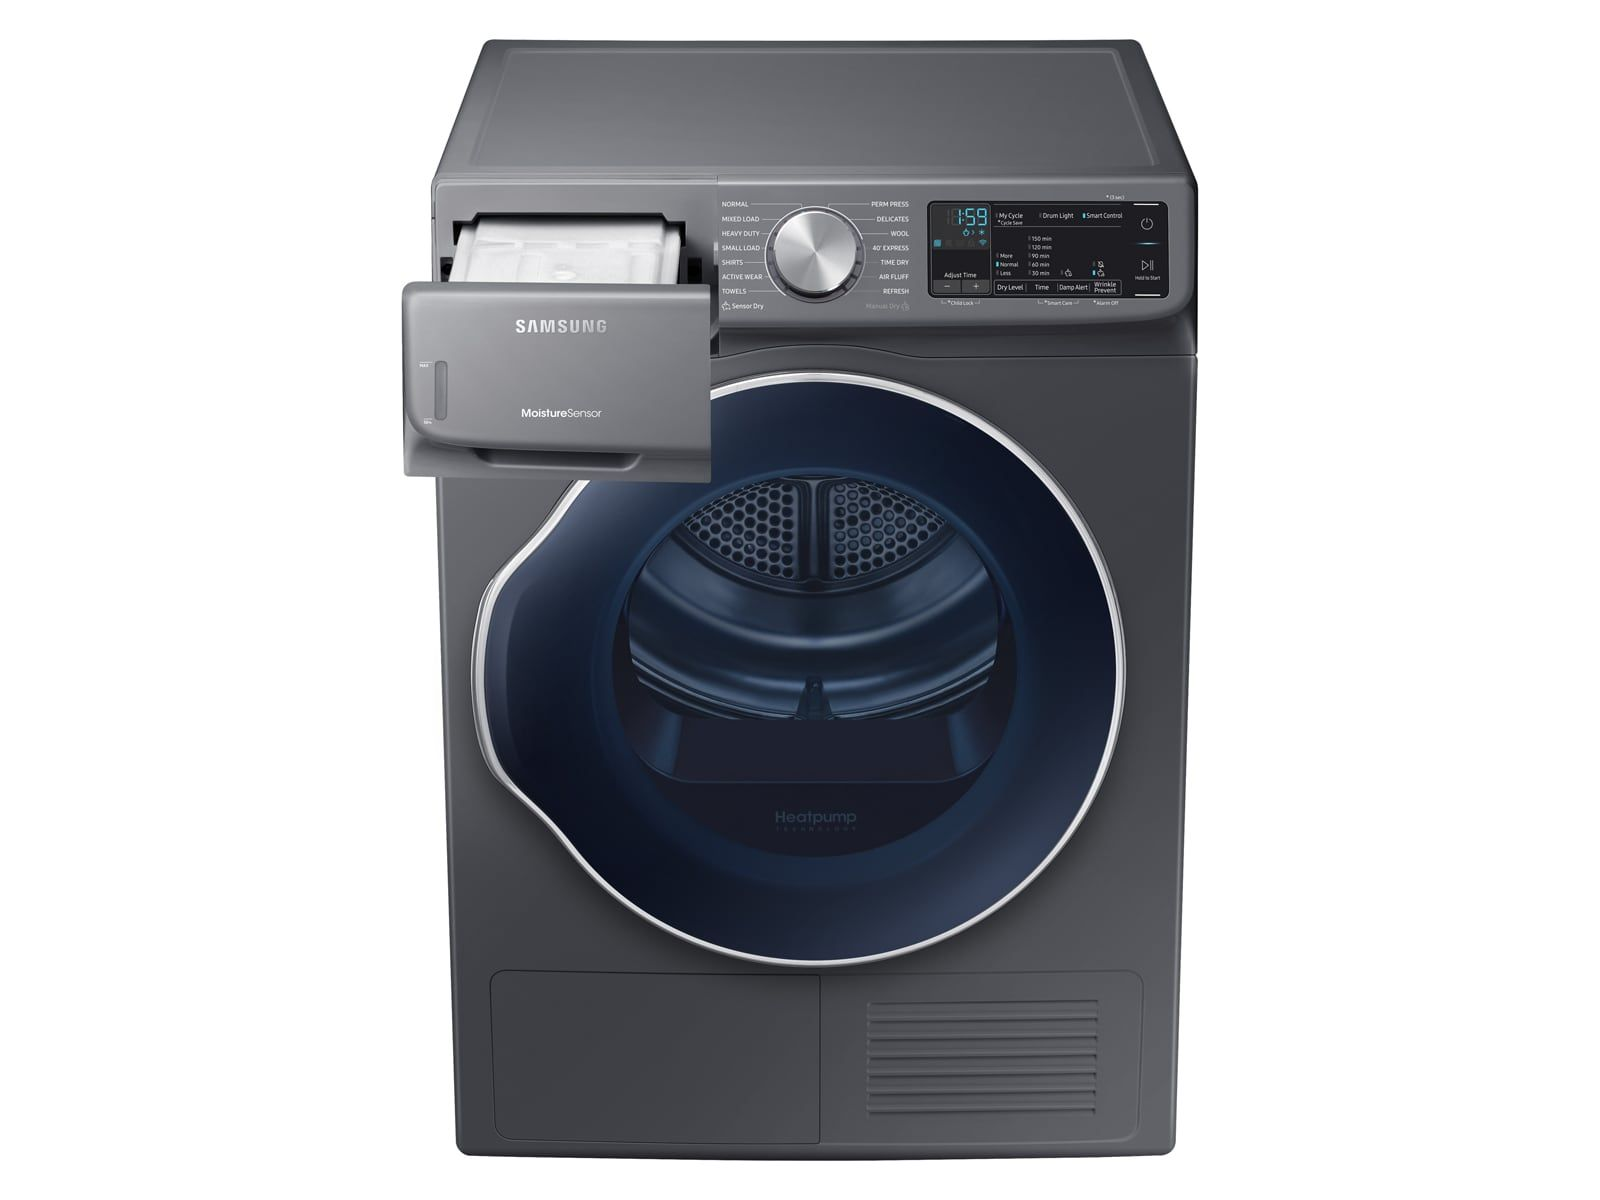 Heat Pump Clothes Smart Dryer 4 0 Cu Ft In Inox Grey Dv22n6850hx Samsung Us Heat Pump Pumps Electric Heat Pump